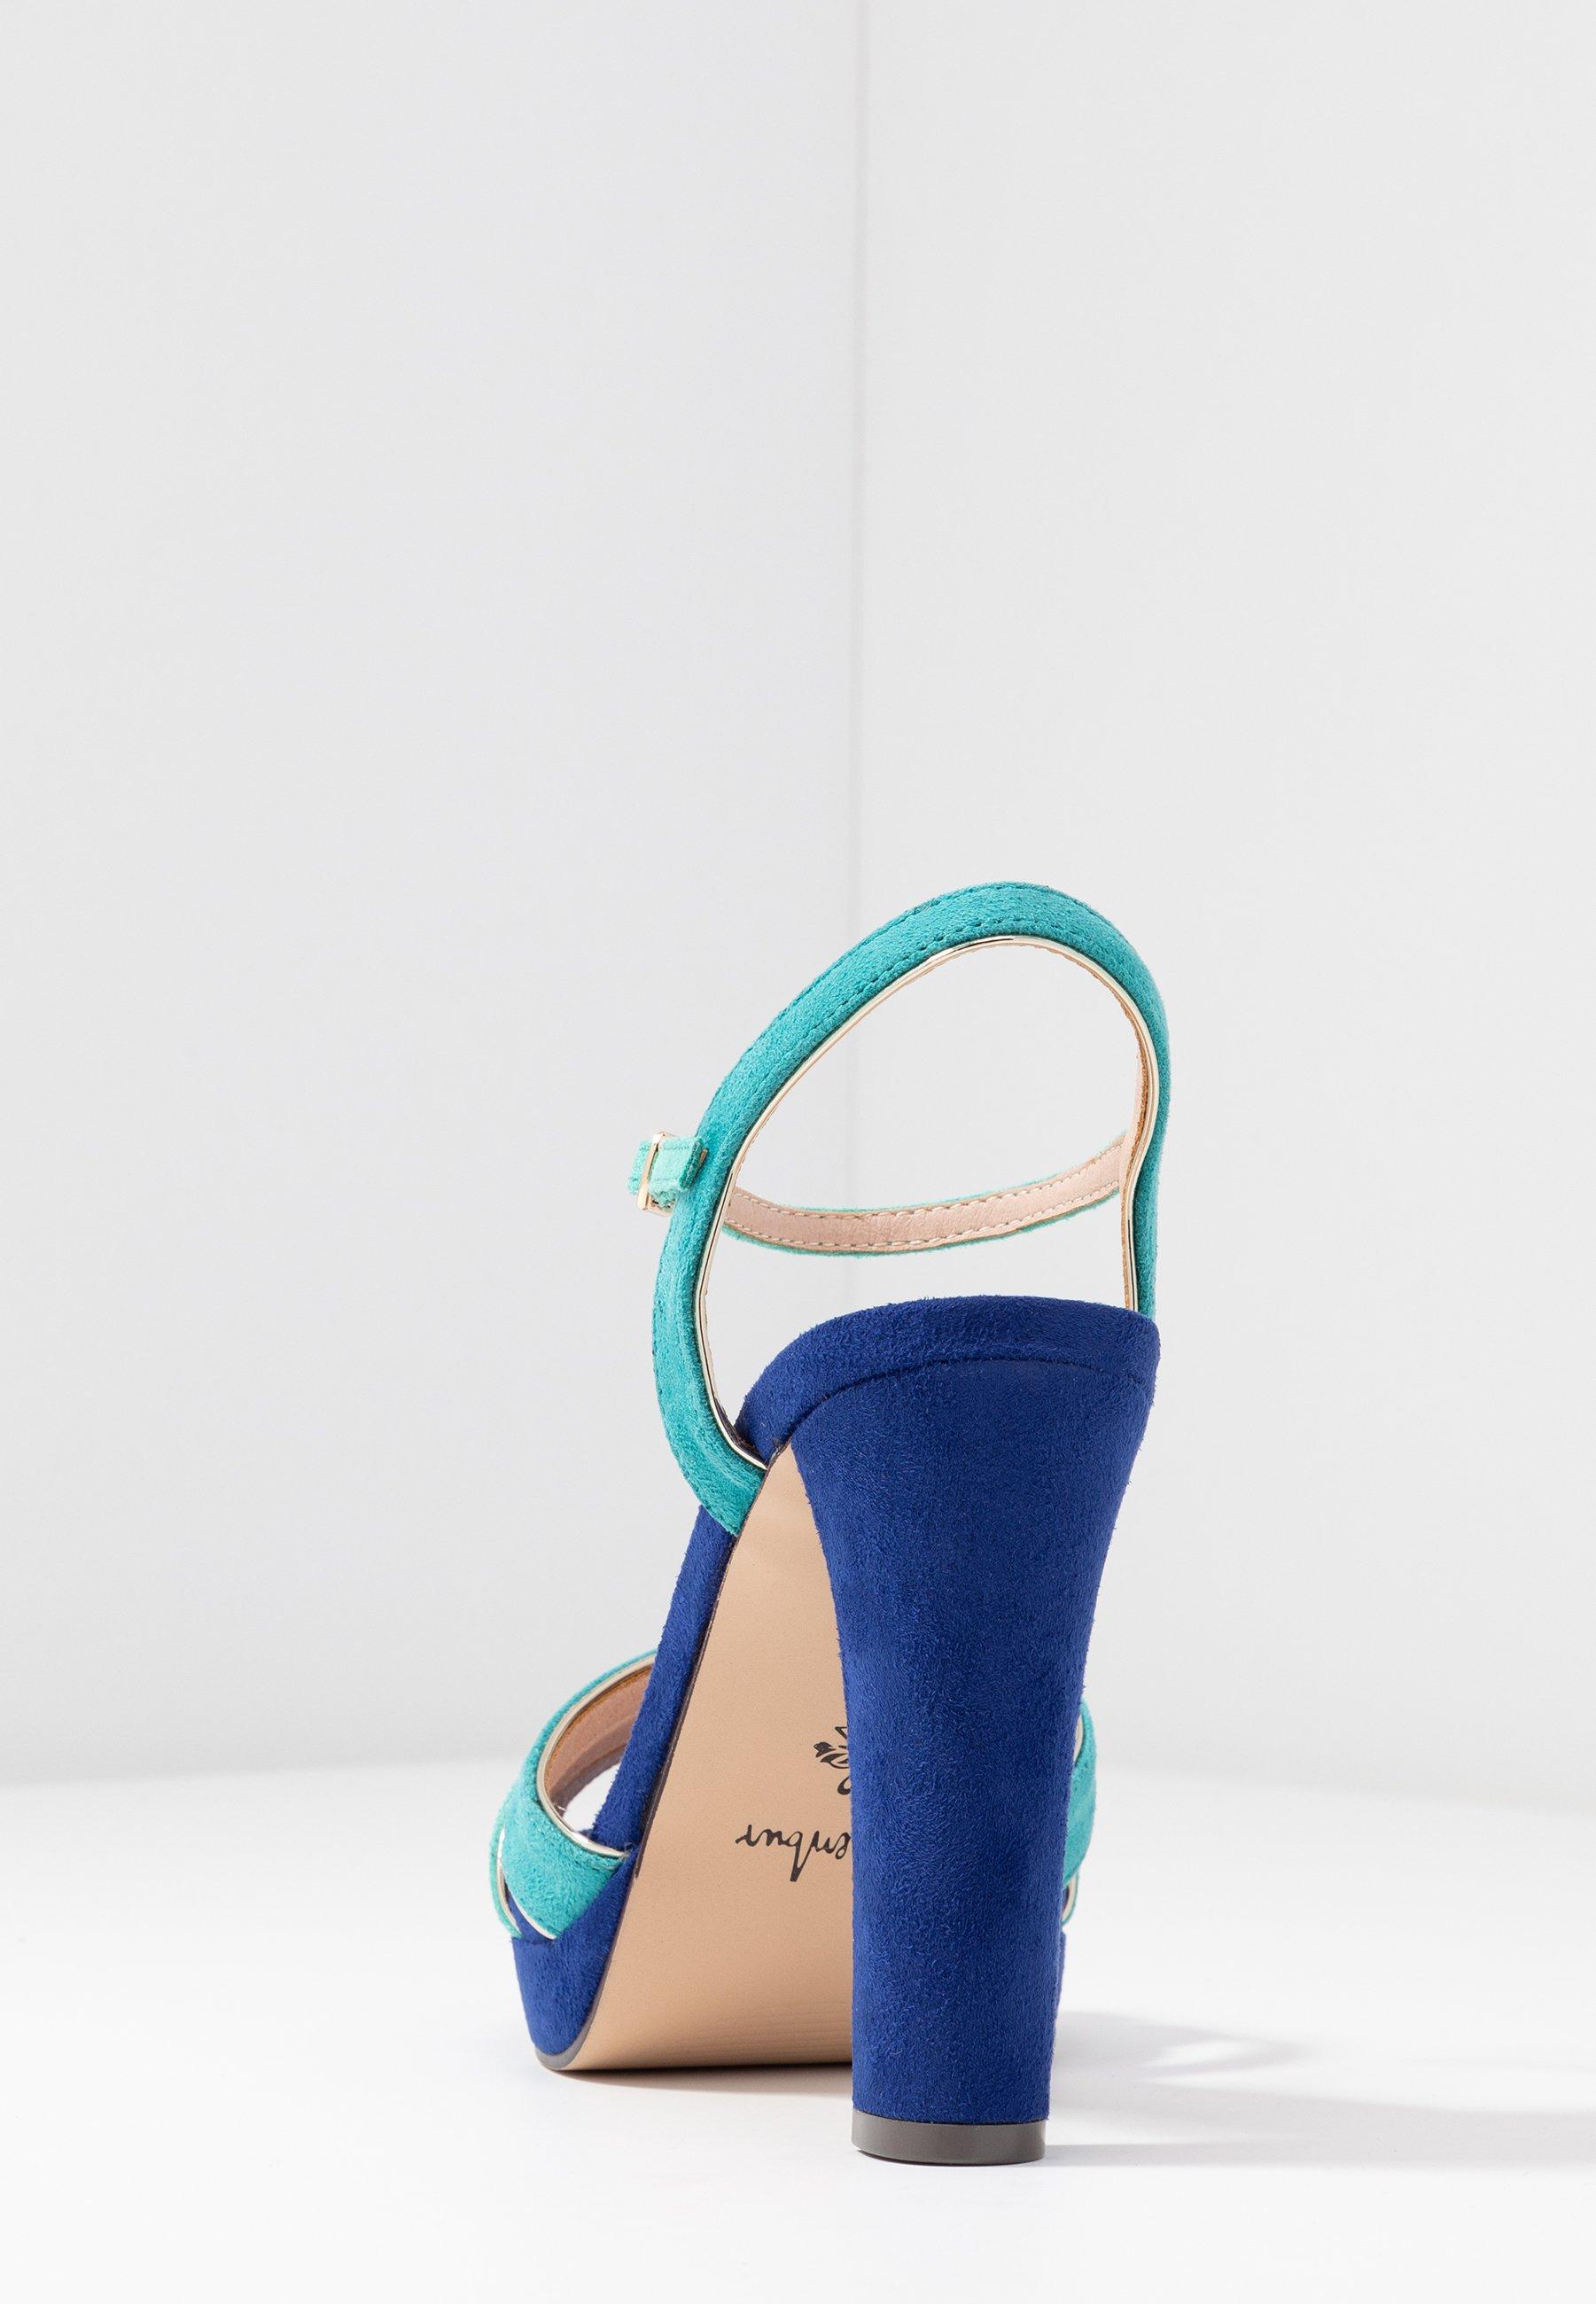 Menbur Sandali Con Tacco - Dazzling Blue Of2x0nk